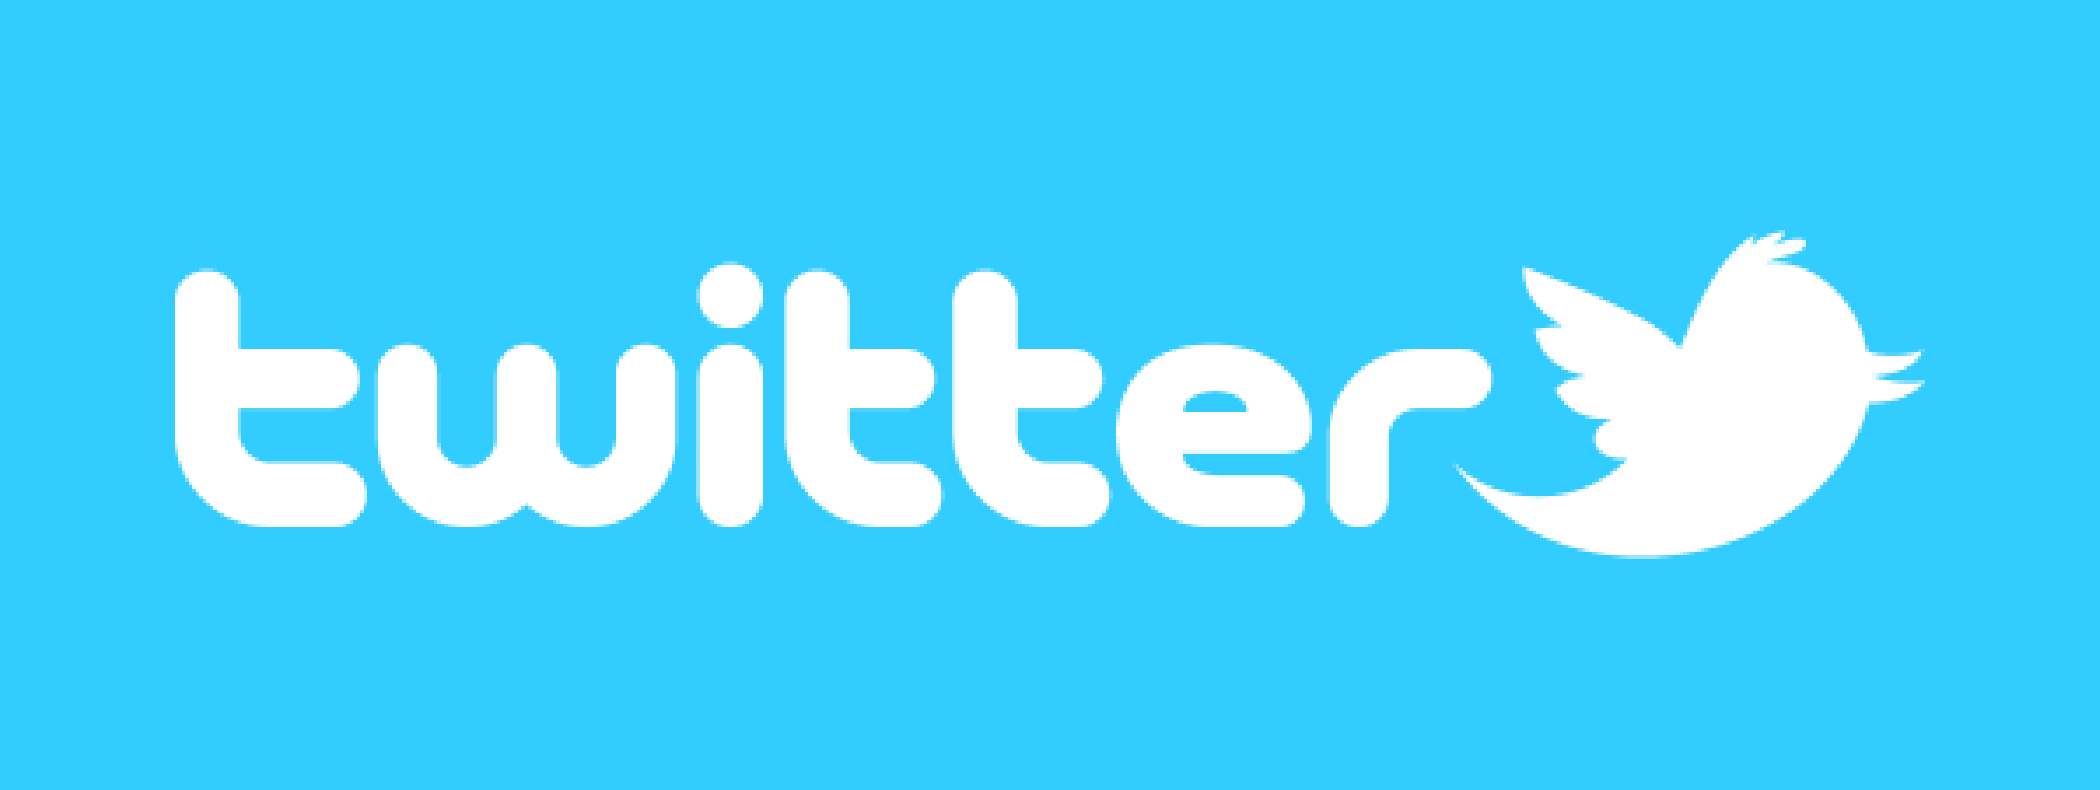 Twitter dizaynda kiçik yenilik edəcək!